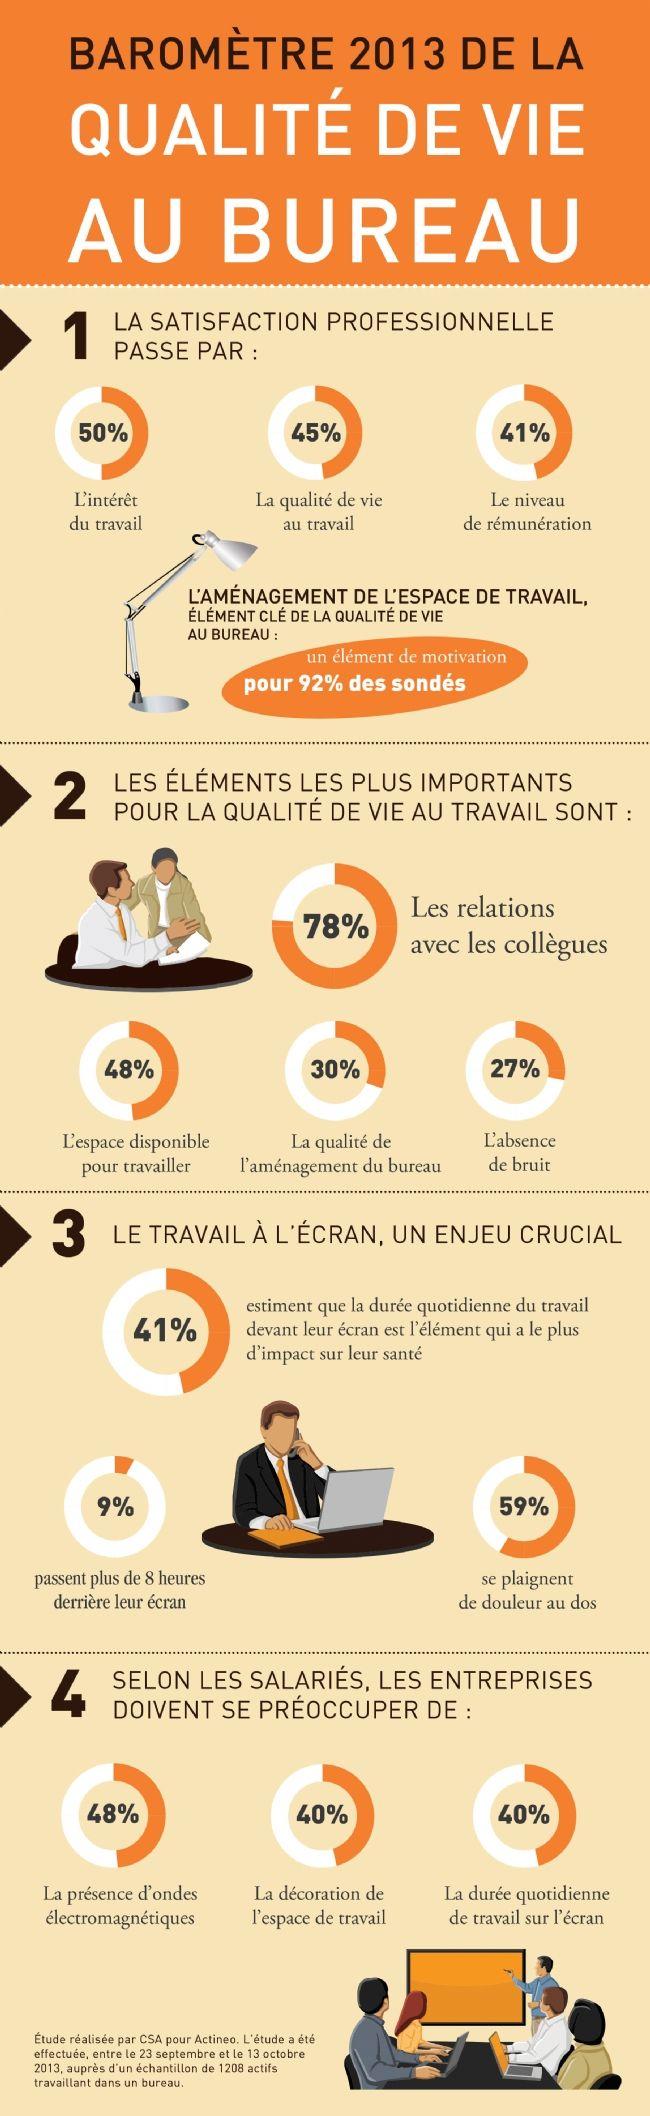 infographie-qualite-vie-bureau-2013-actineo